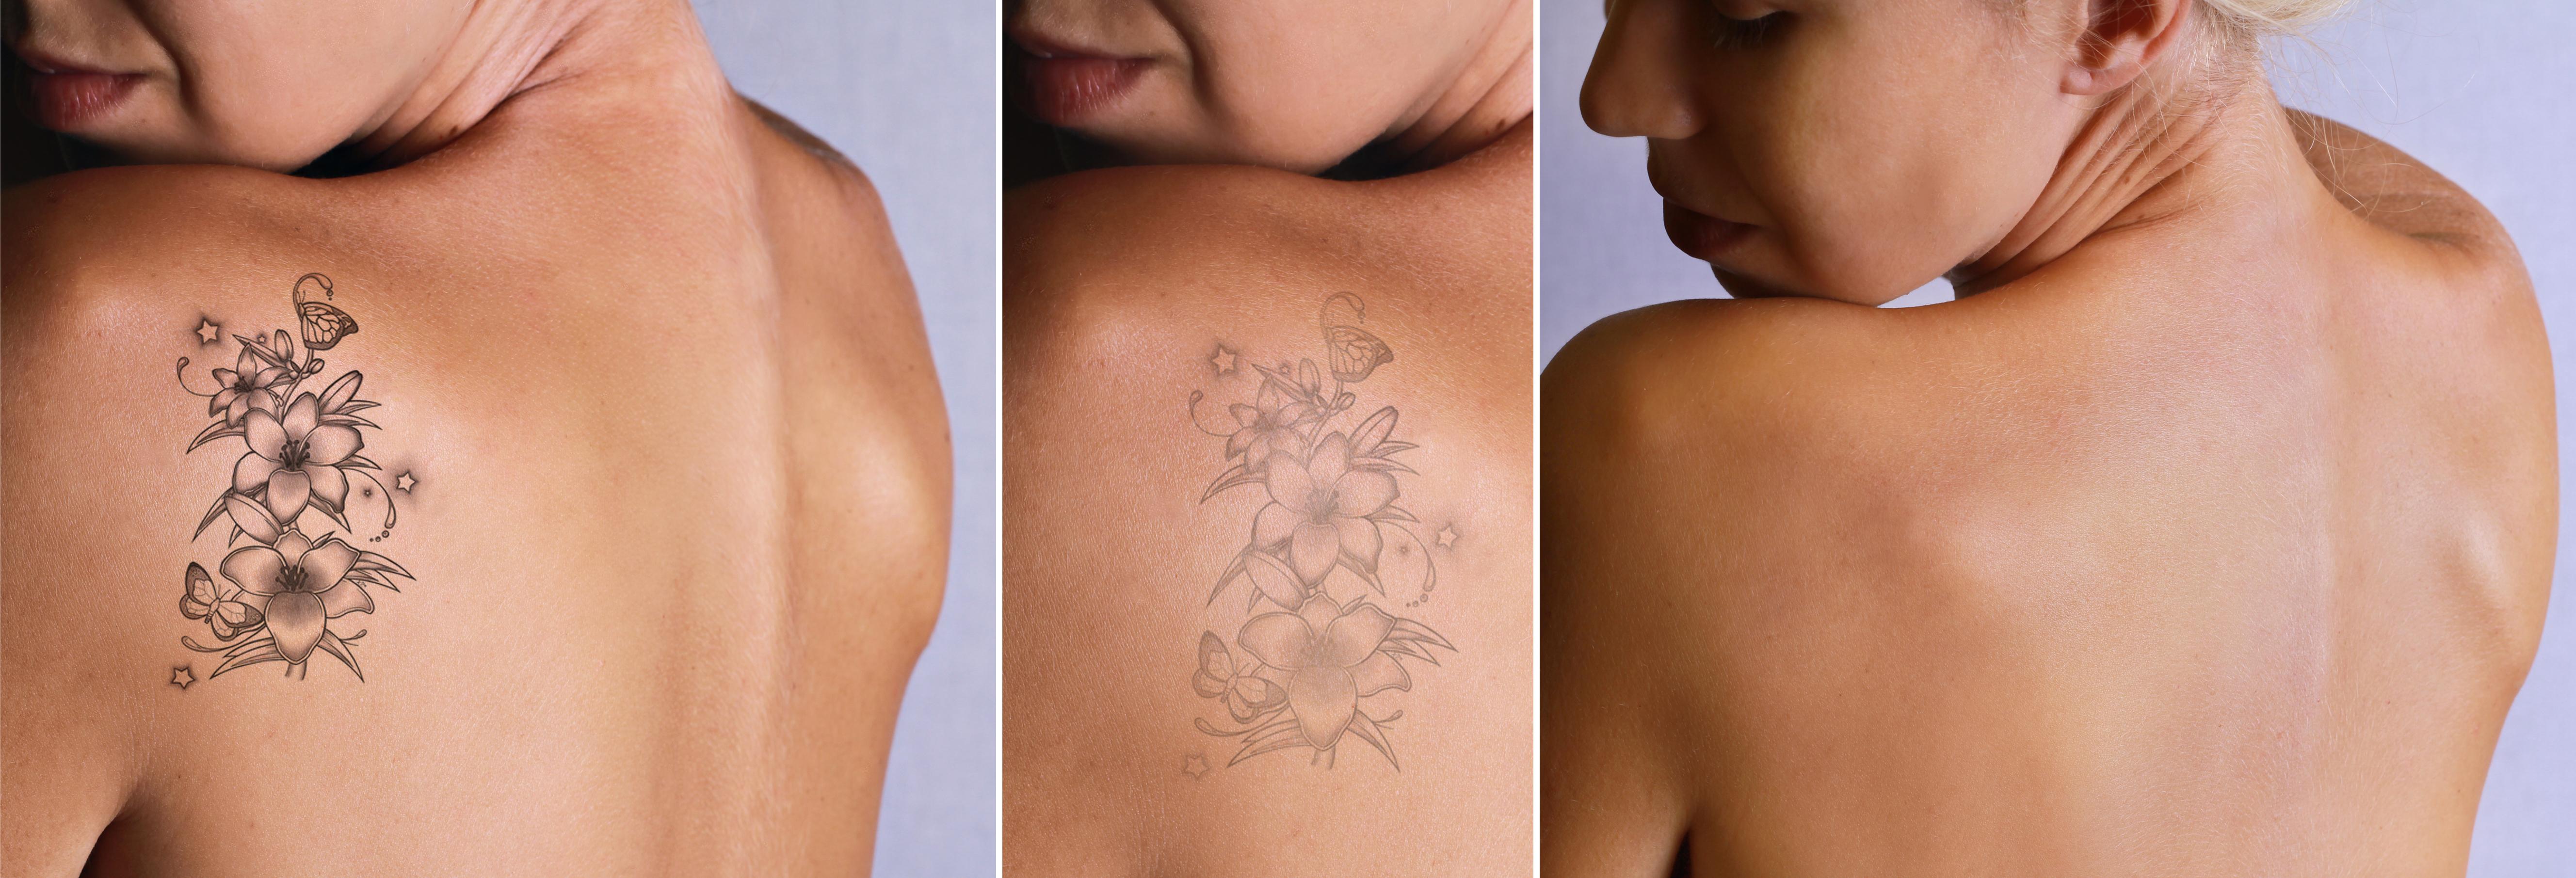 fases de la eliminacion de tatuajes